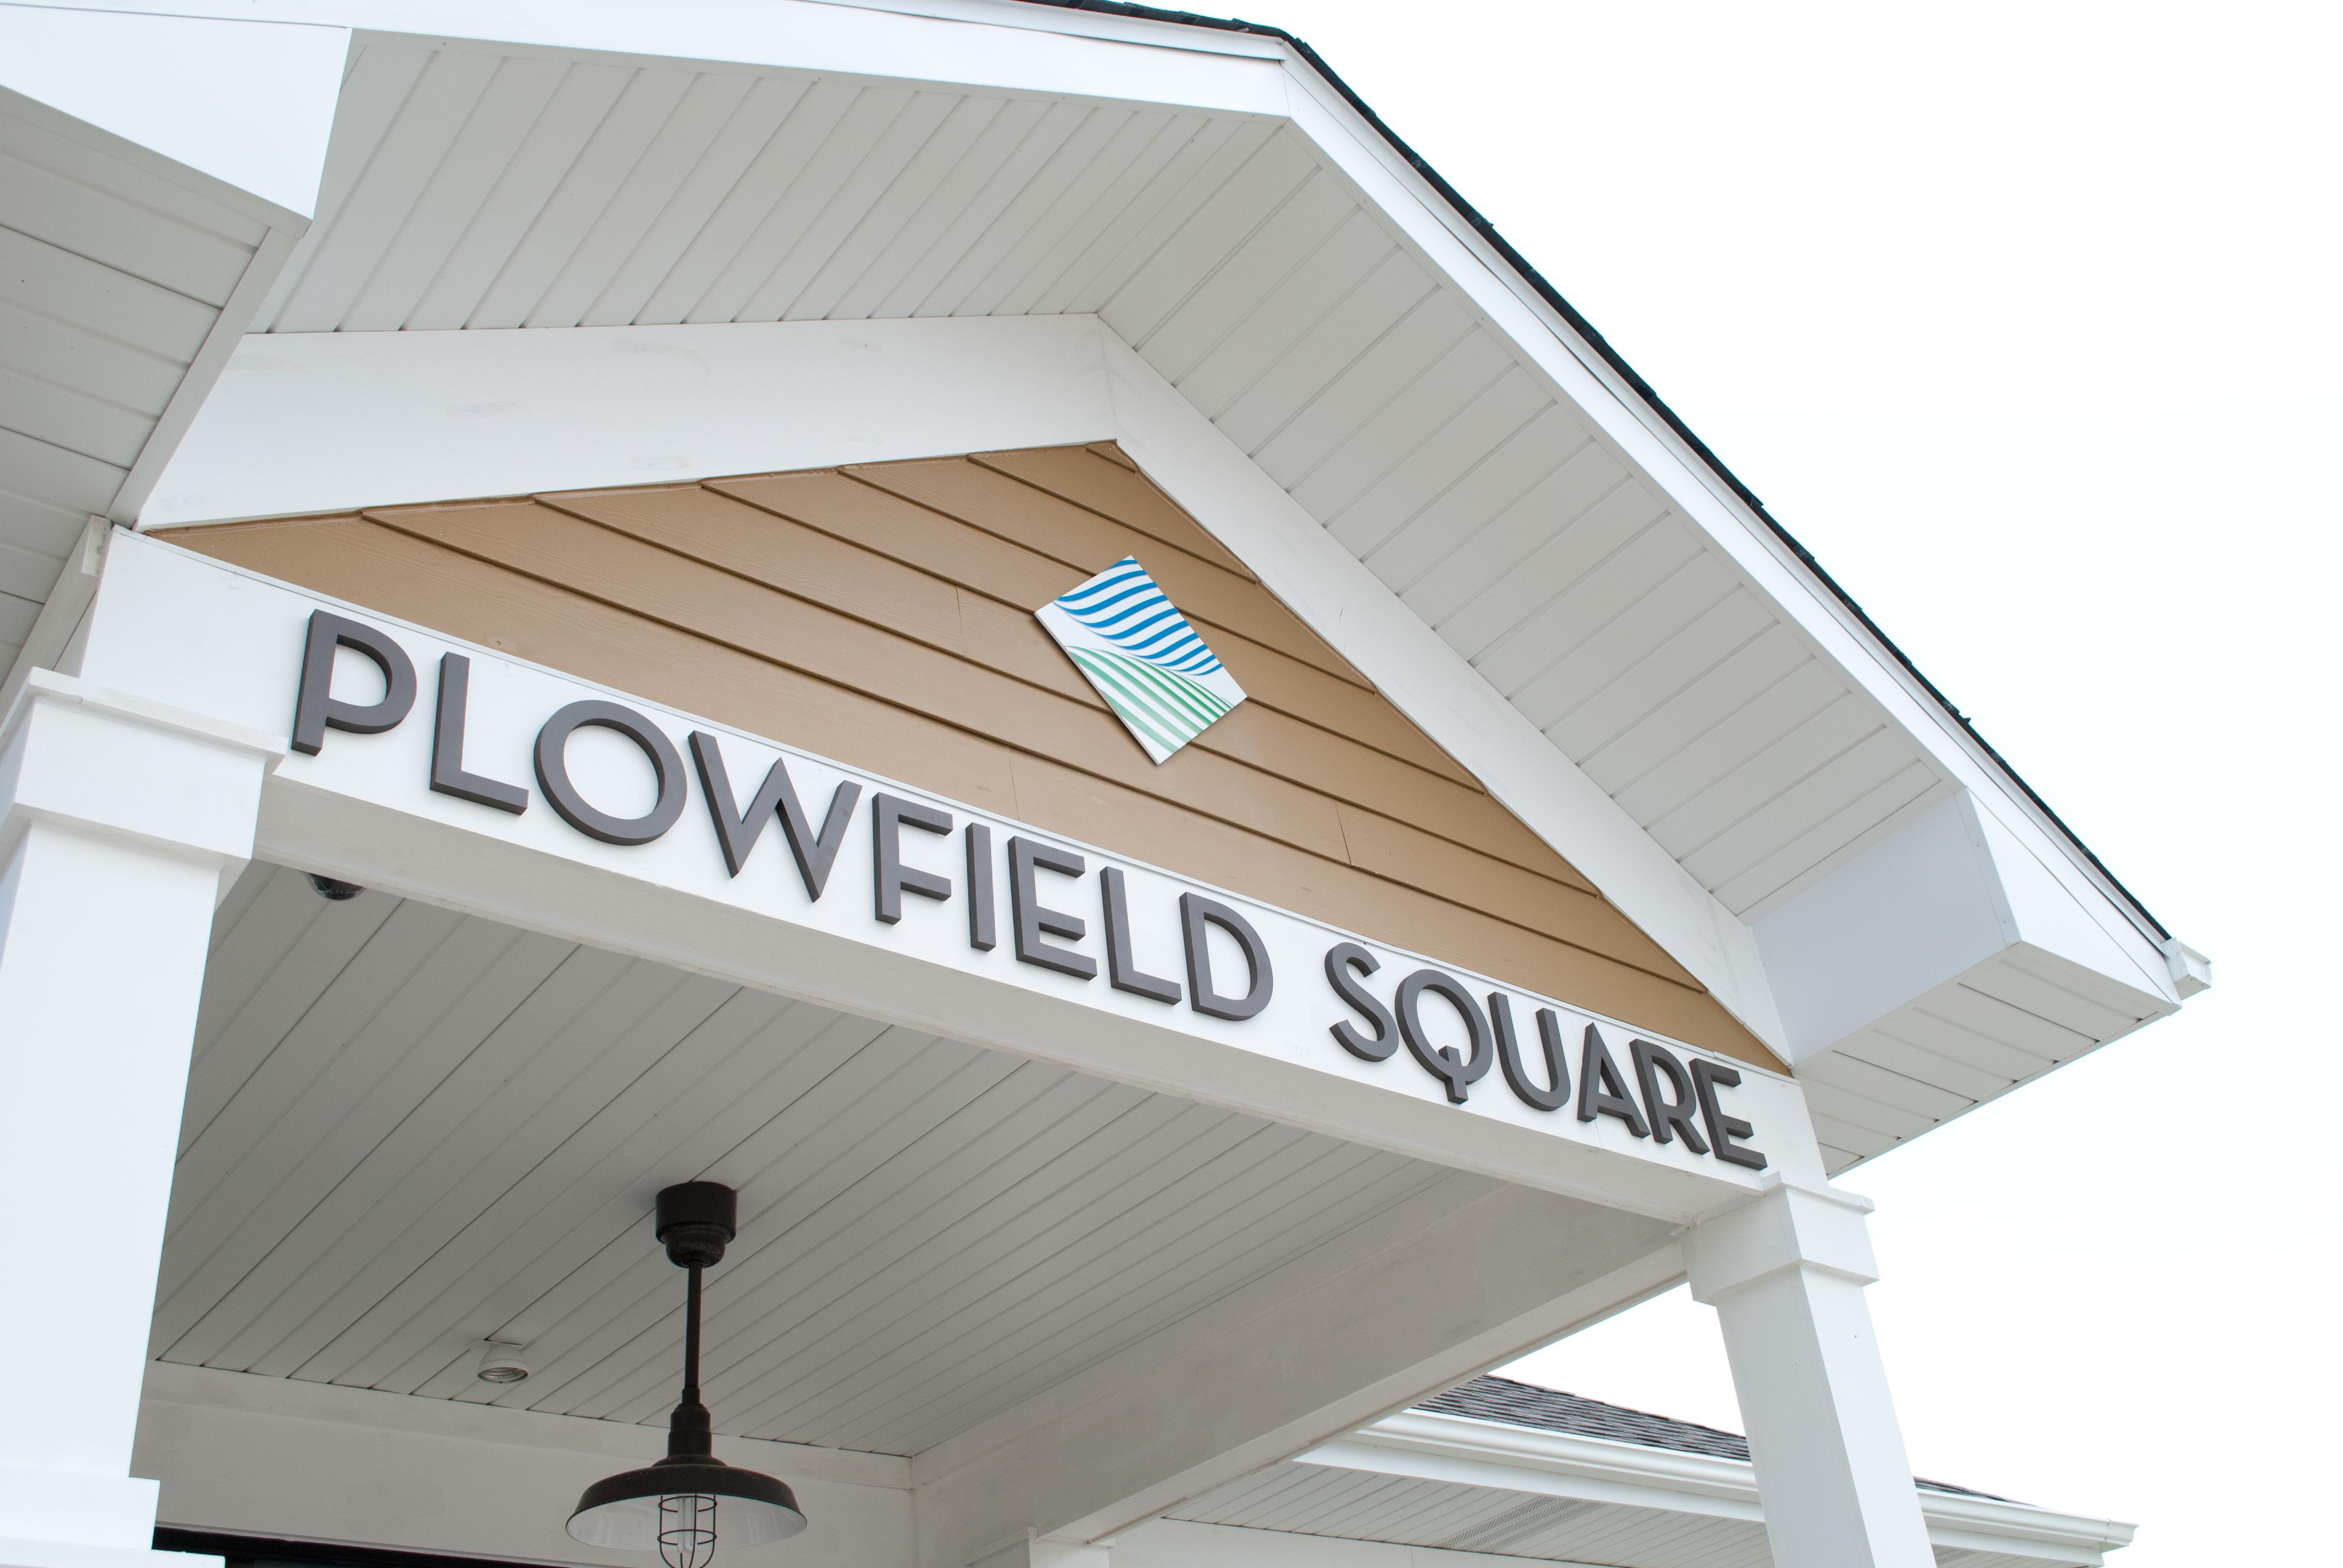 Plowfield Square